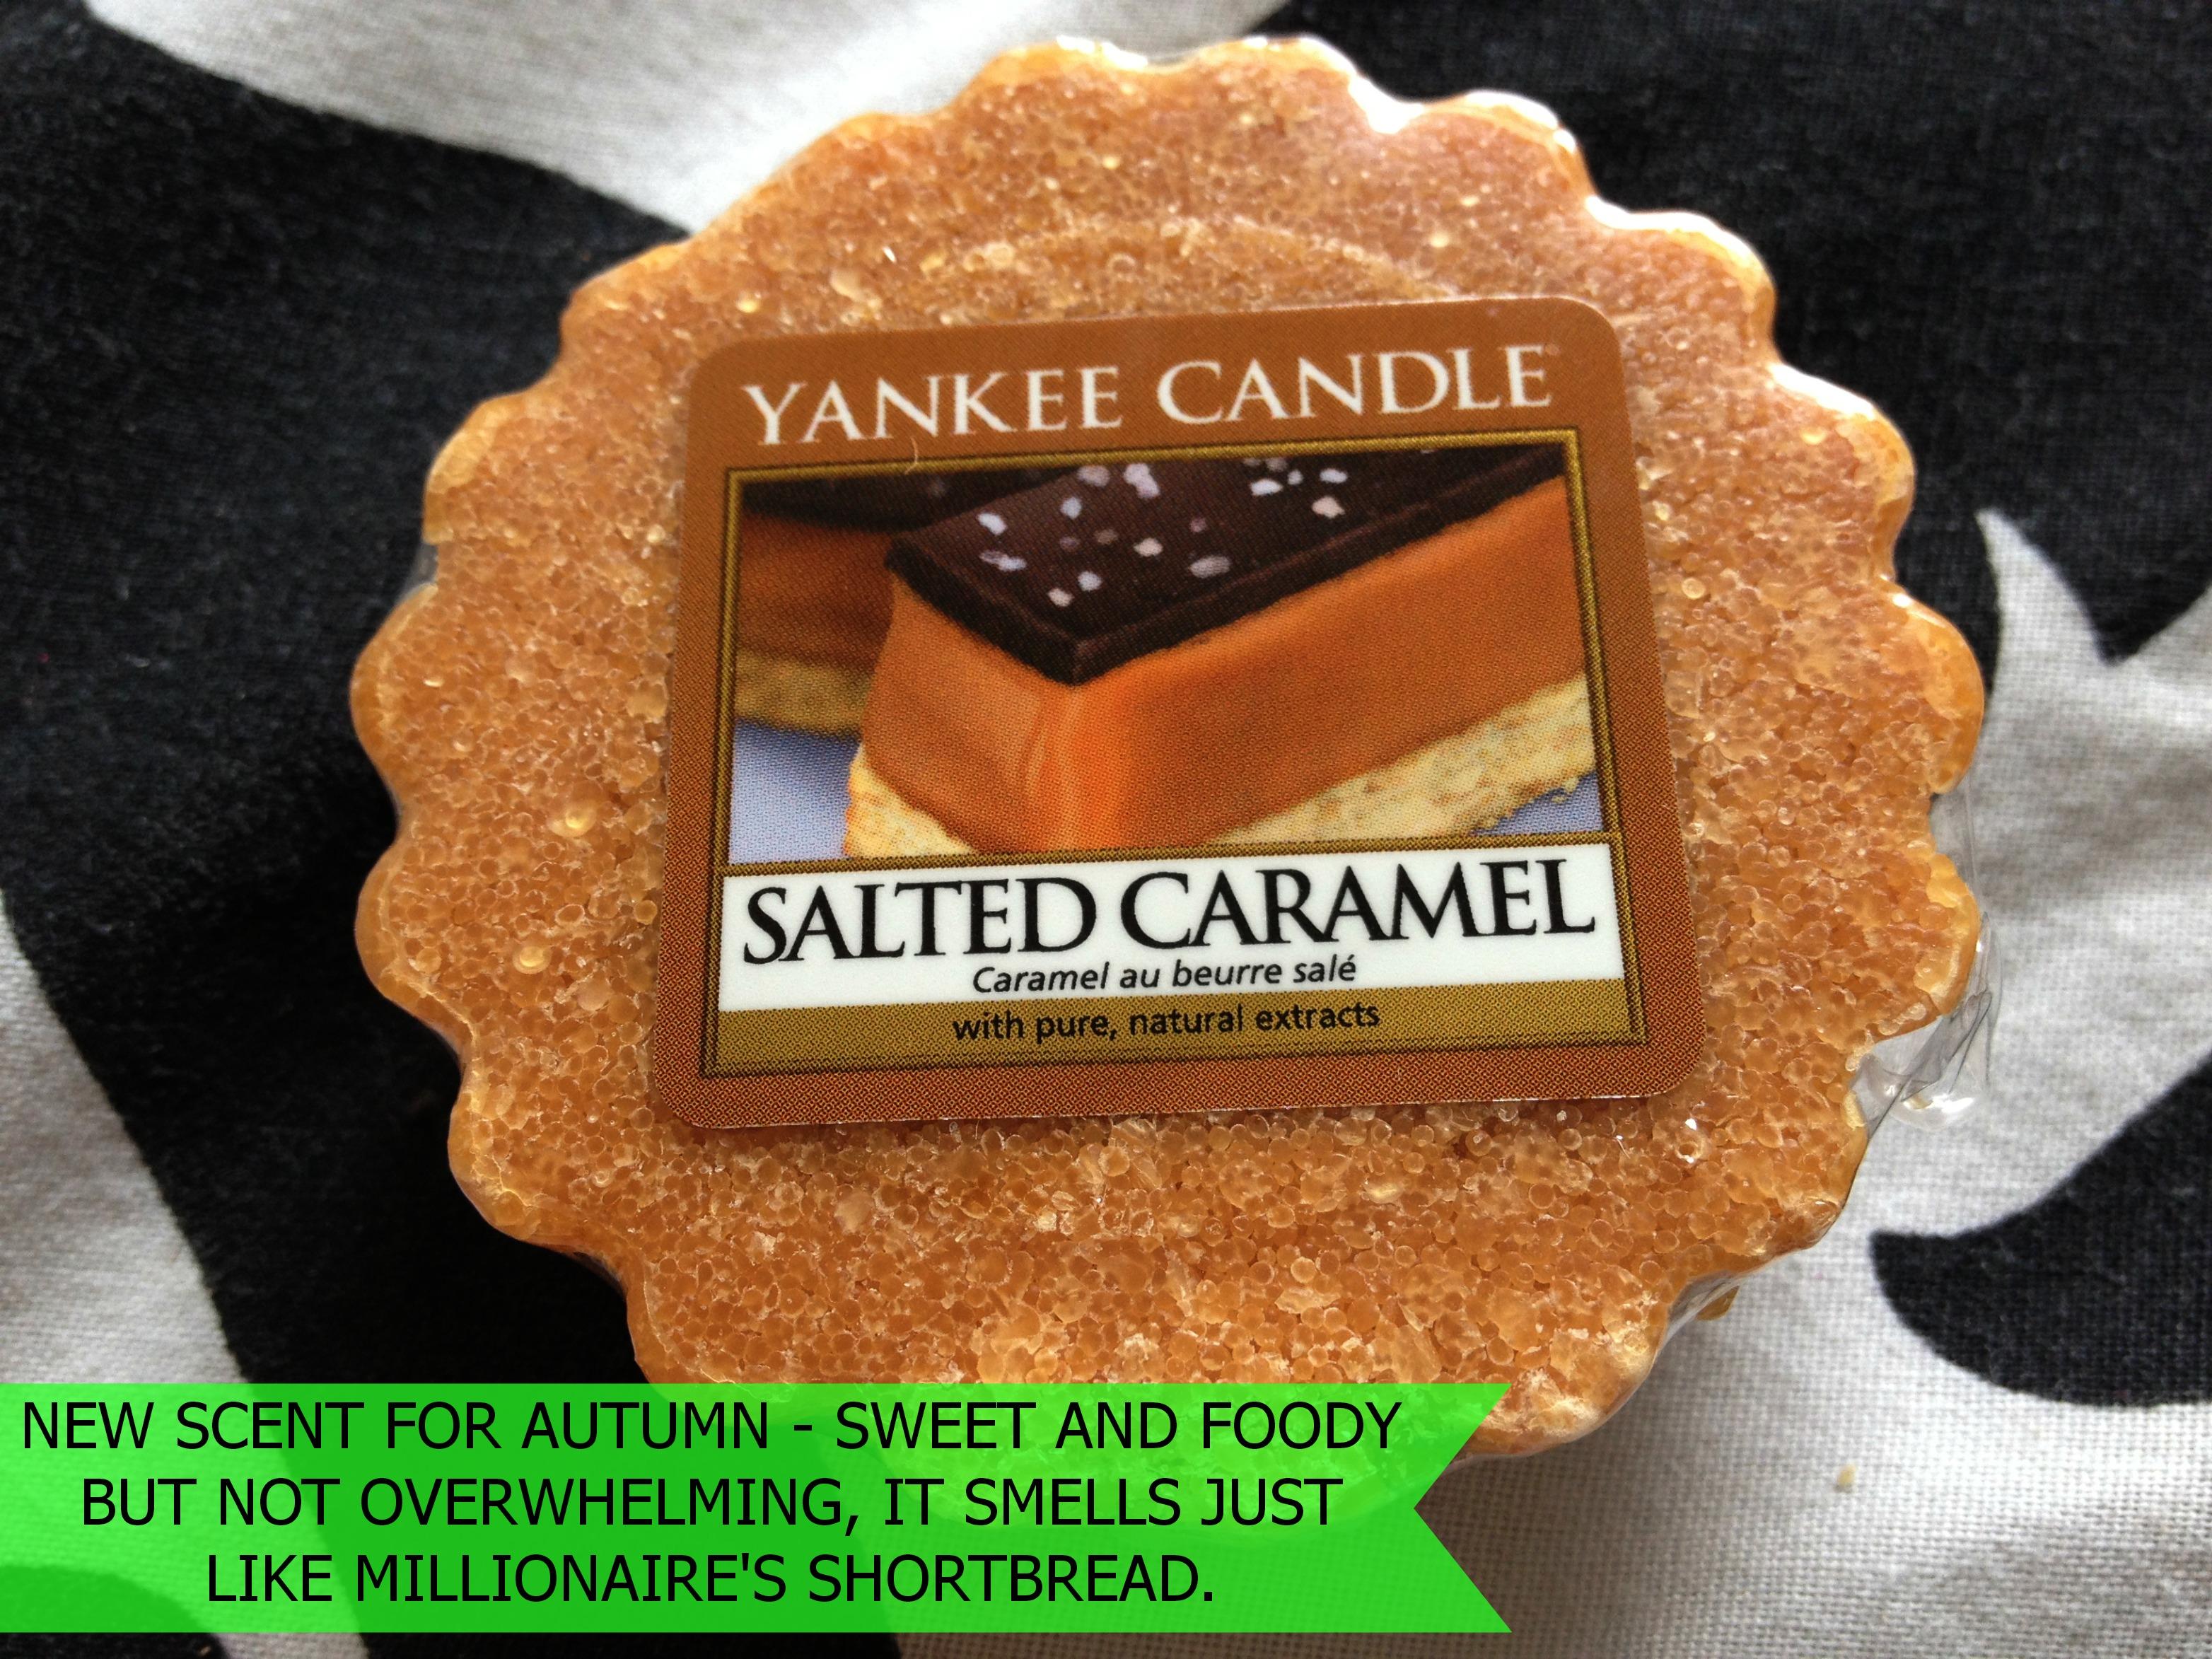 Yankee_Candle_Tart_Haul_Salted_Caramel